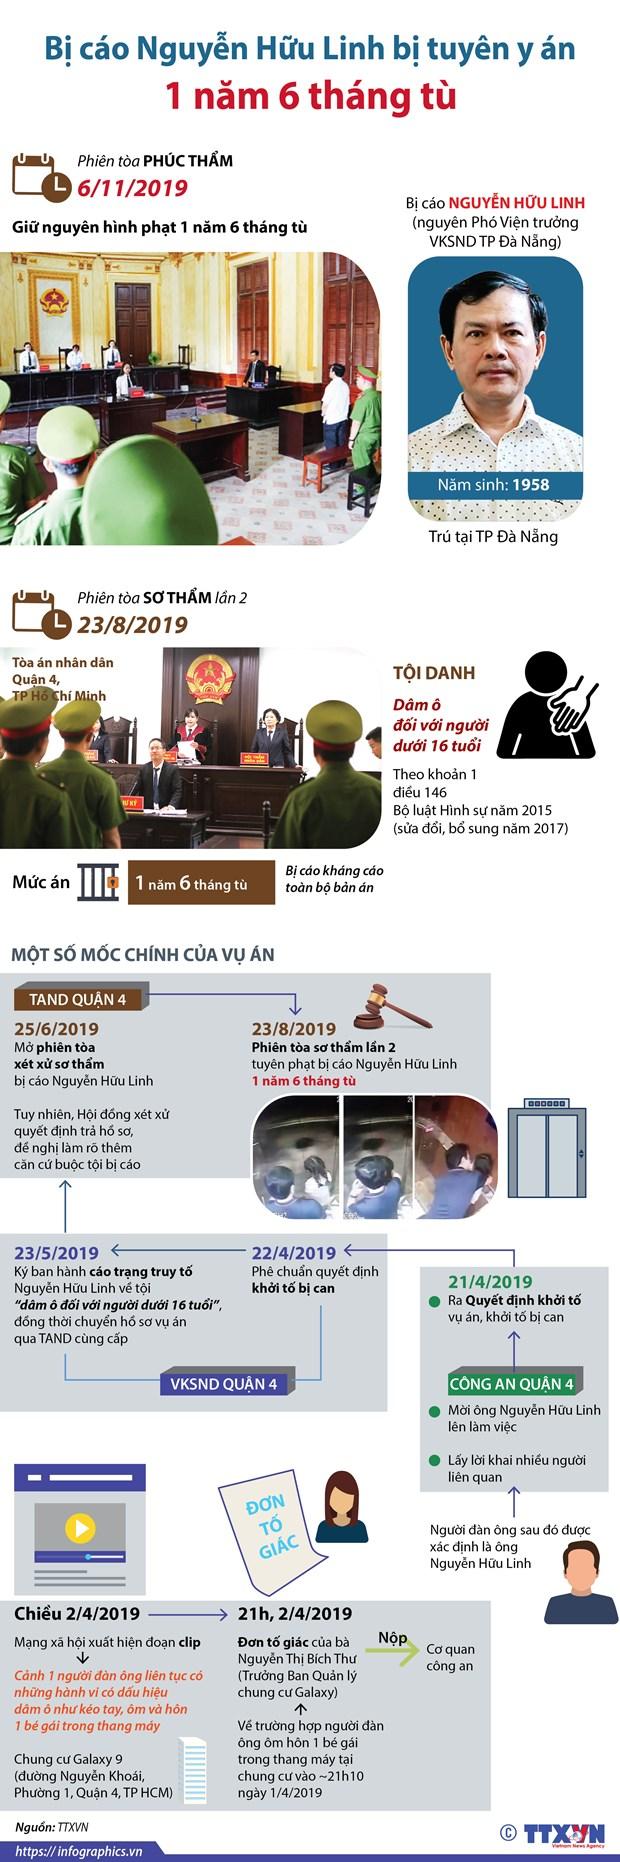 [Infographics] Bi cao Nguyen Huu Linh bi tuyen y an 1 nam 6 thang tu hinh anh 1